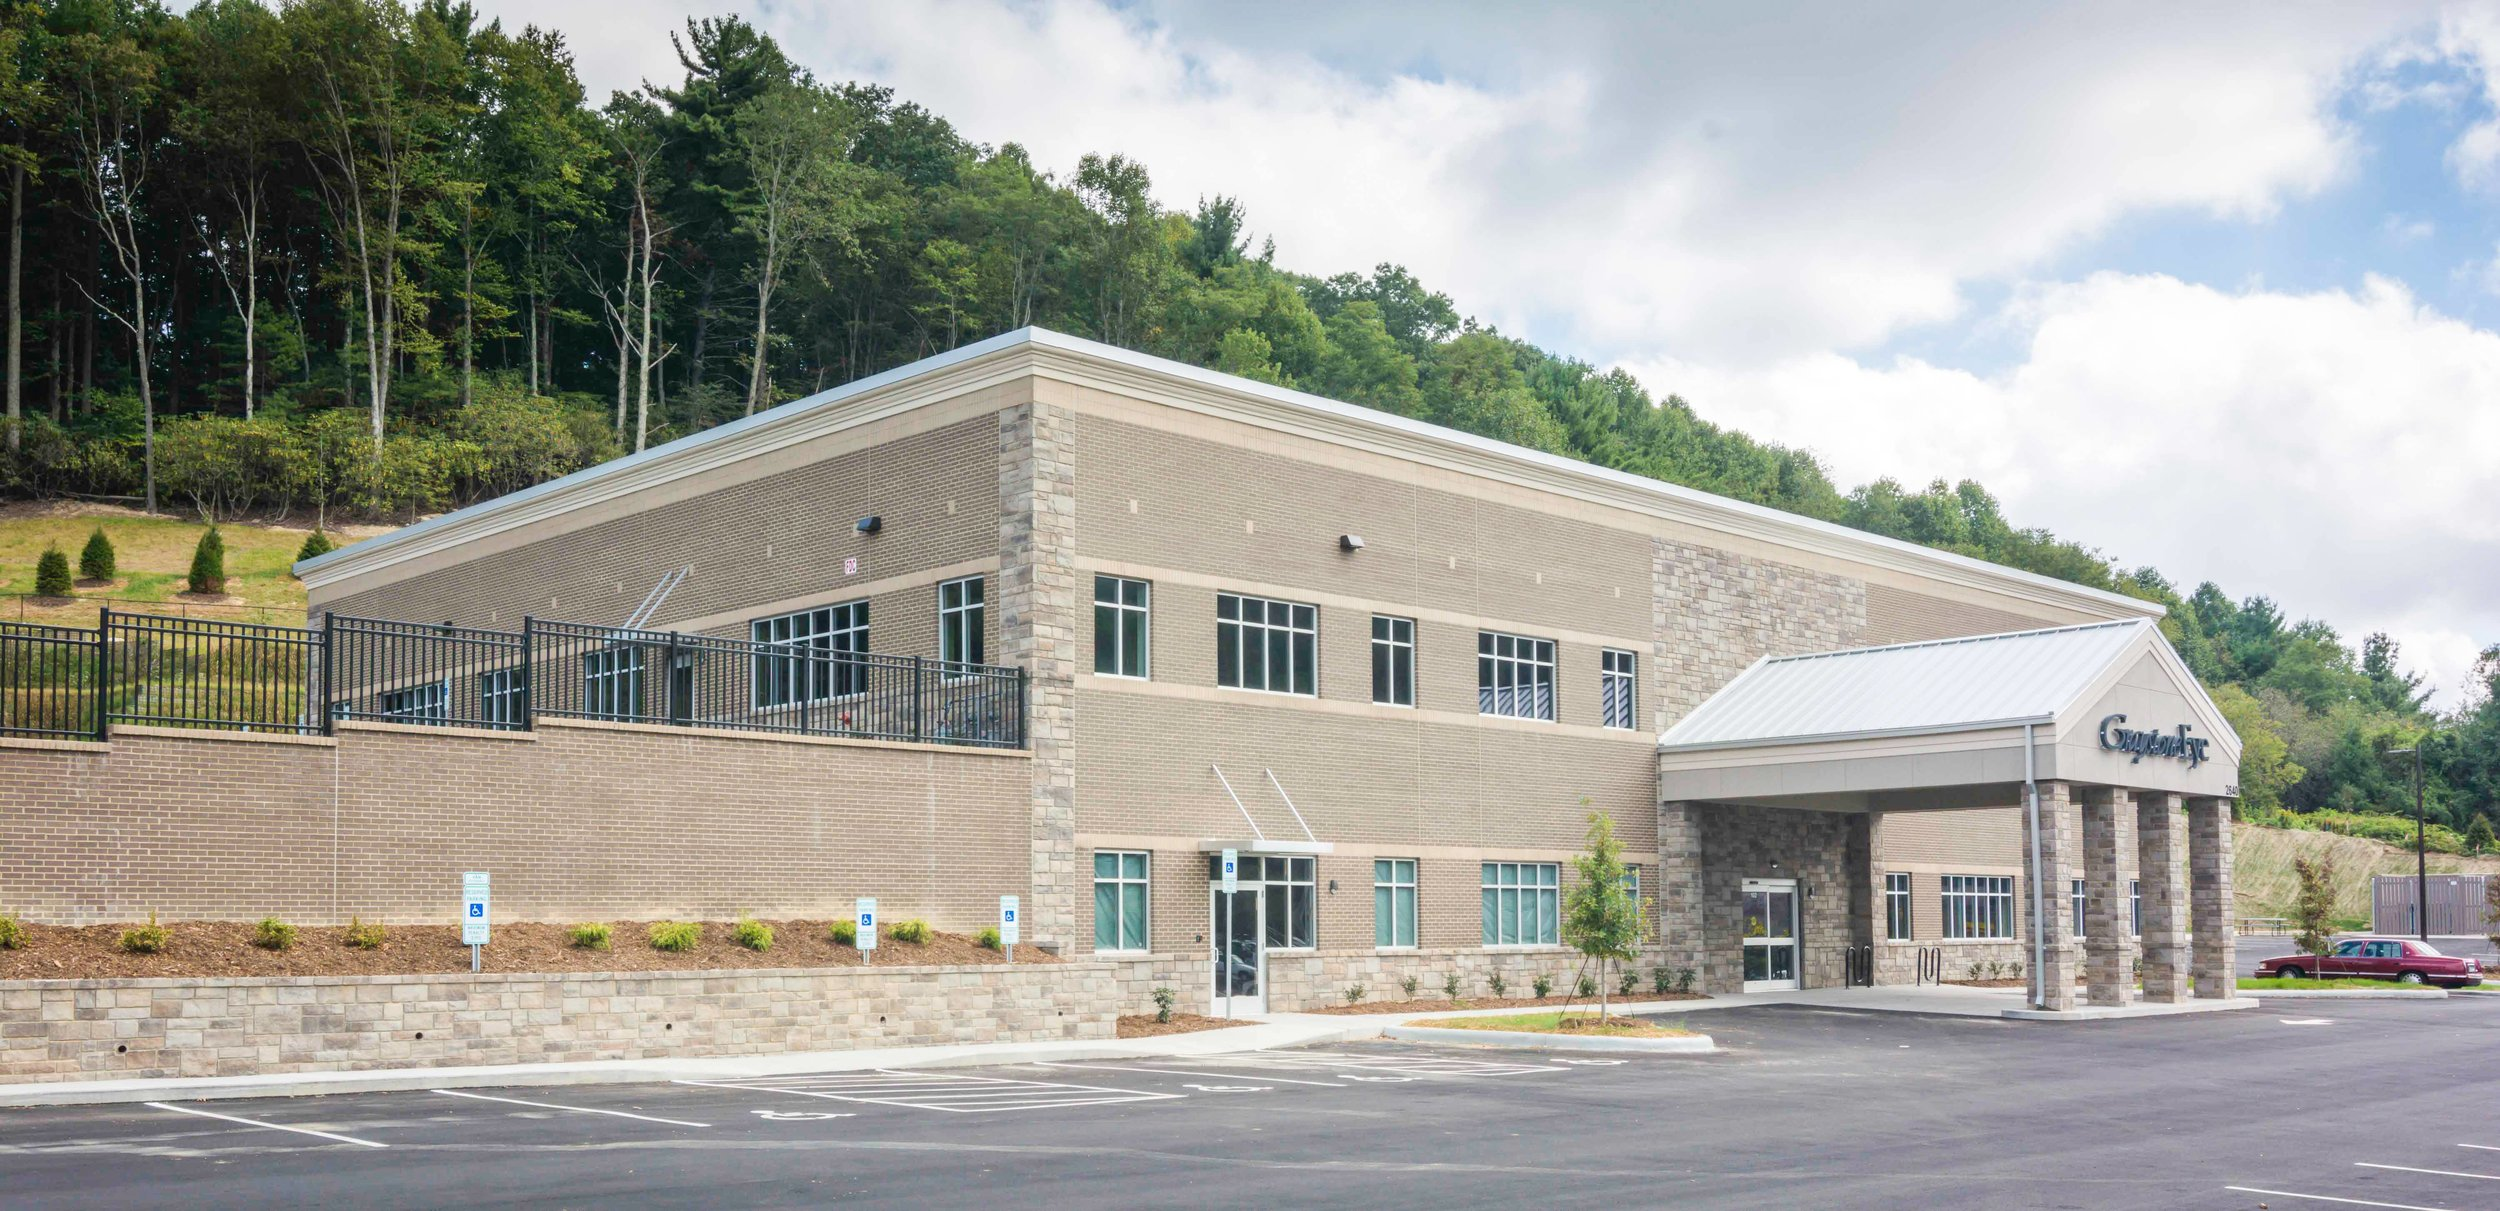 Greystone Eye Center, Boone